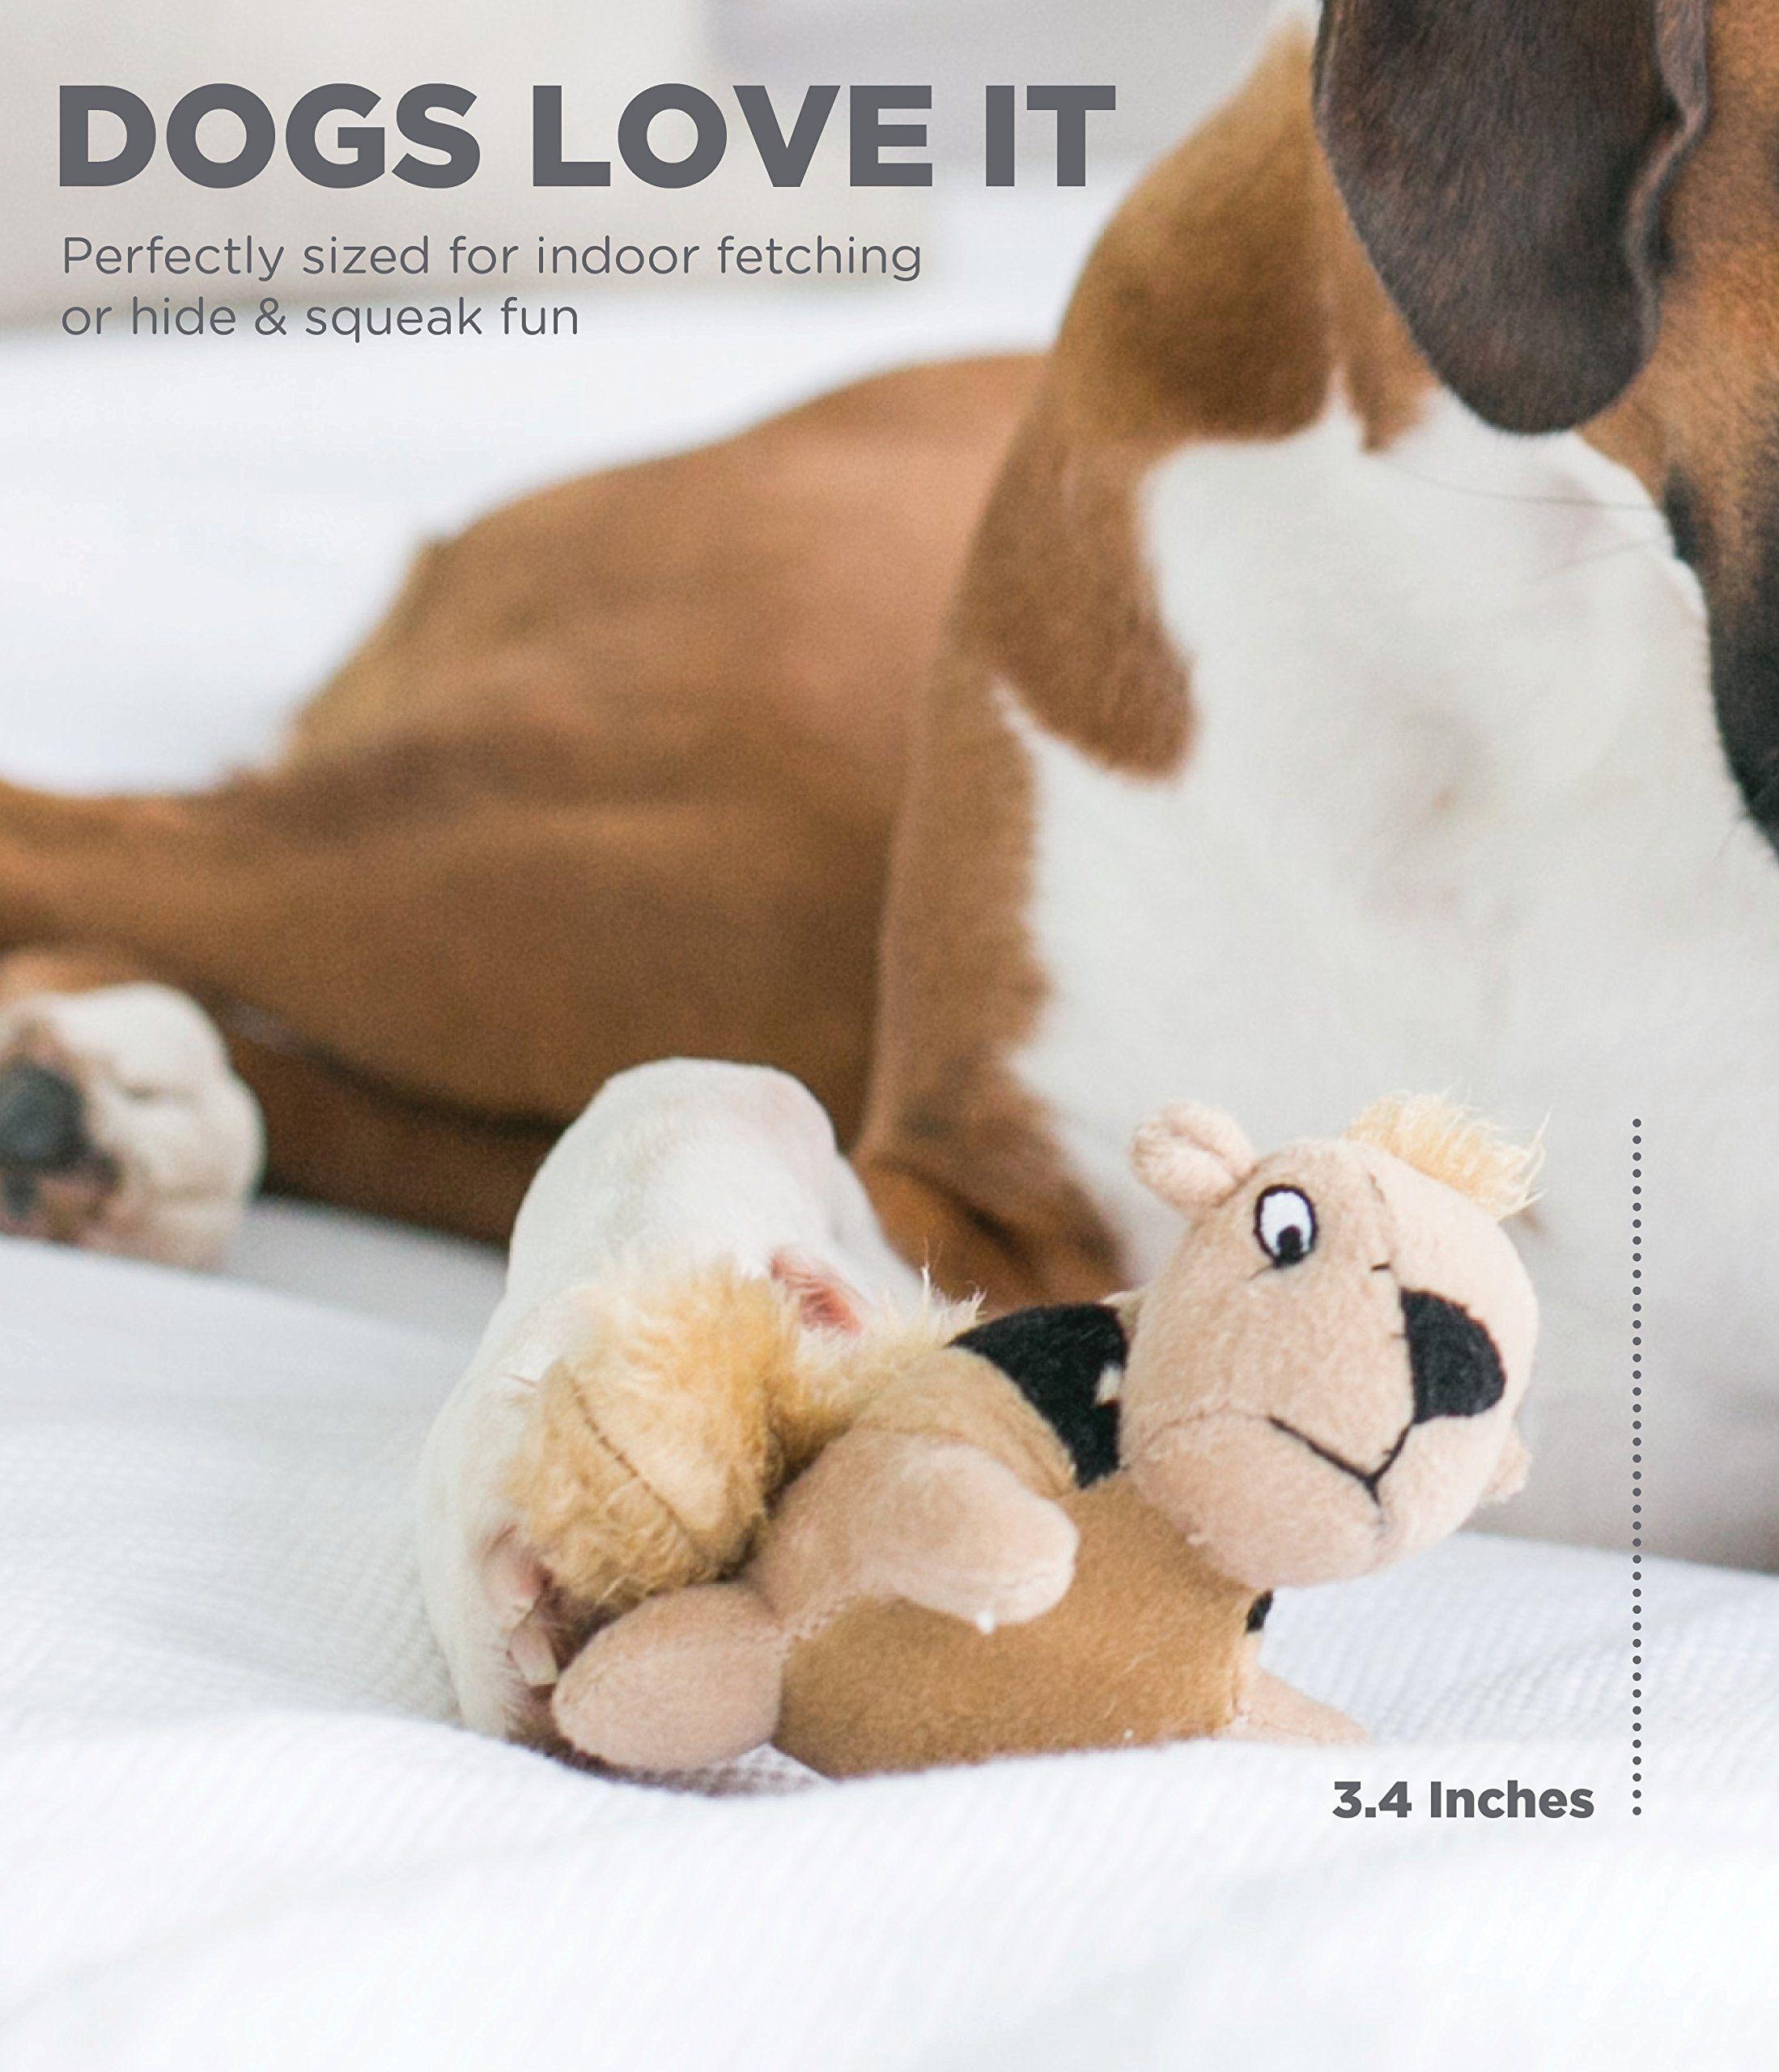 Outward Hound Squeakina Animals Dog Squeak Toys You Can Get